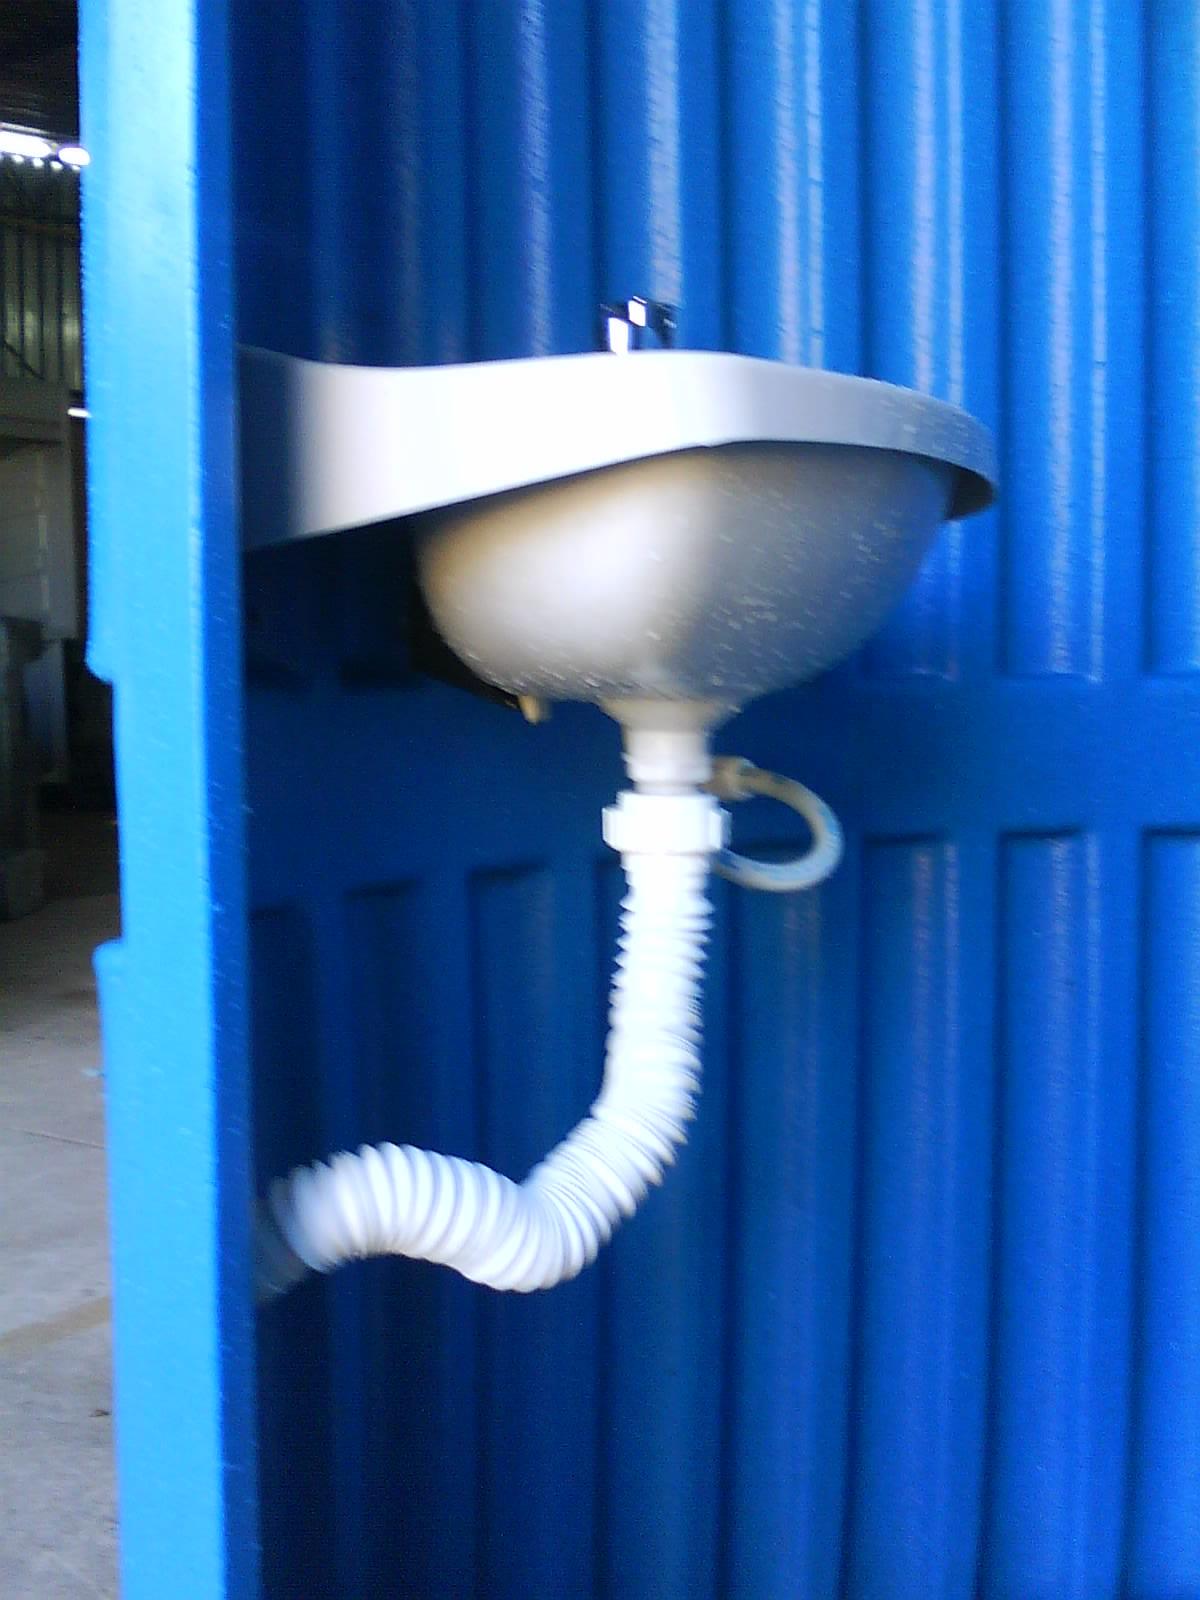 #018ACA Plastic Ambiental Indústria de Materiais Plásticos Ltda. 1200x1600 px Banheiro Ideal Ltda 3001